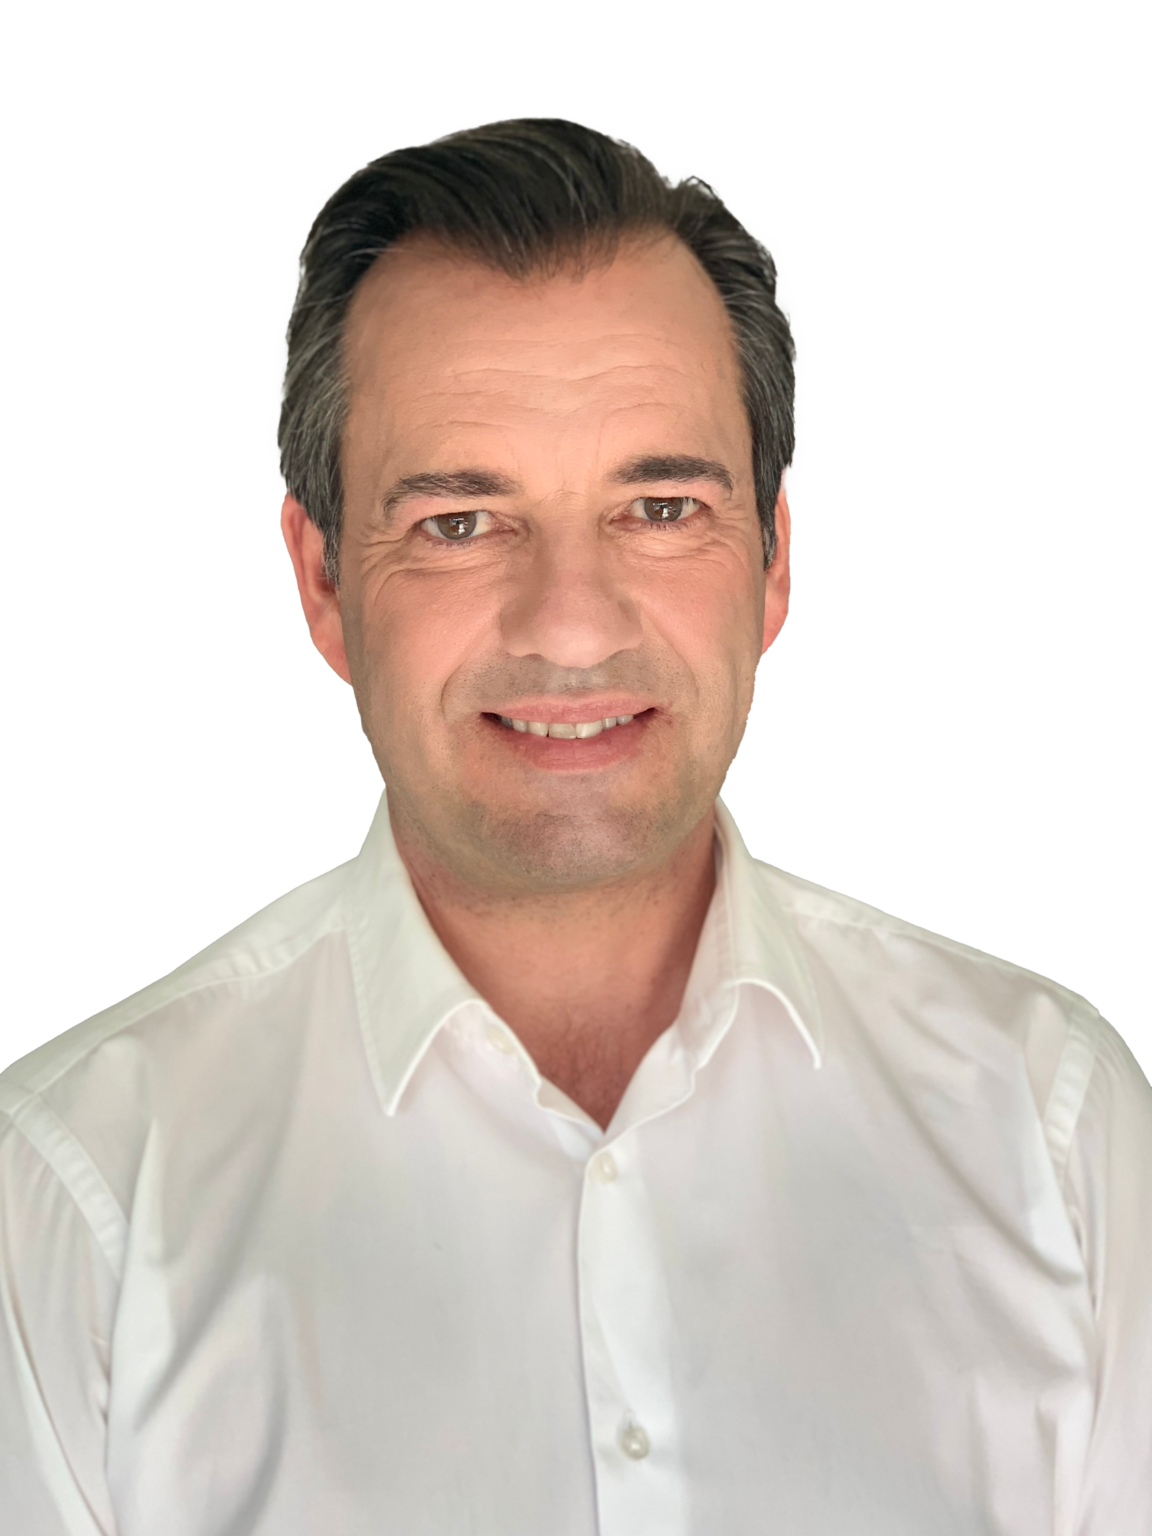 Claus Gersdorff - Ekspert i marketing og sponsor analyser